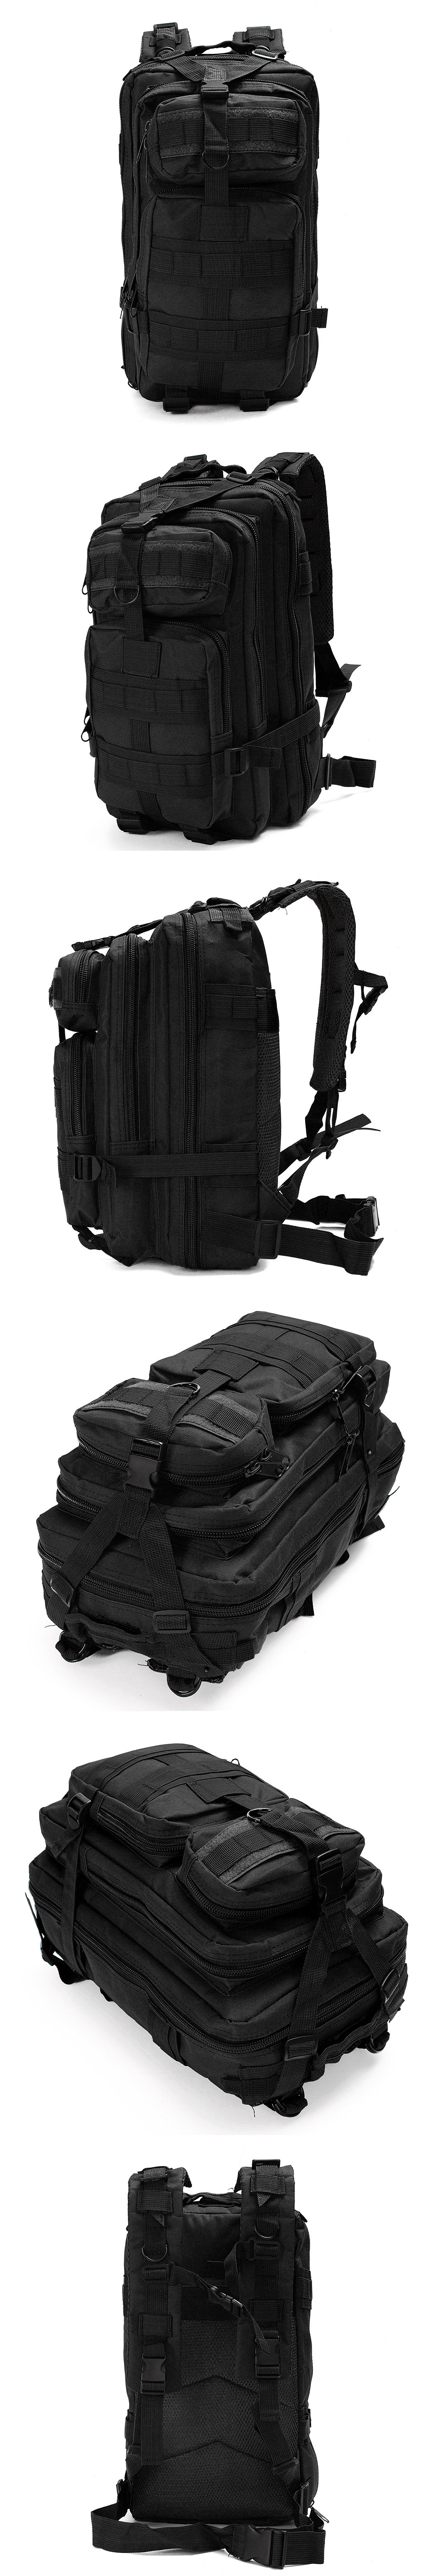 IPRee 30L Outdoor Sac à dos tactique Sac à dos Camping Randonnée Trekking sac à bandoulière